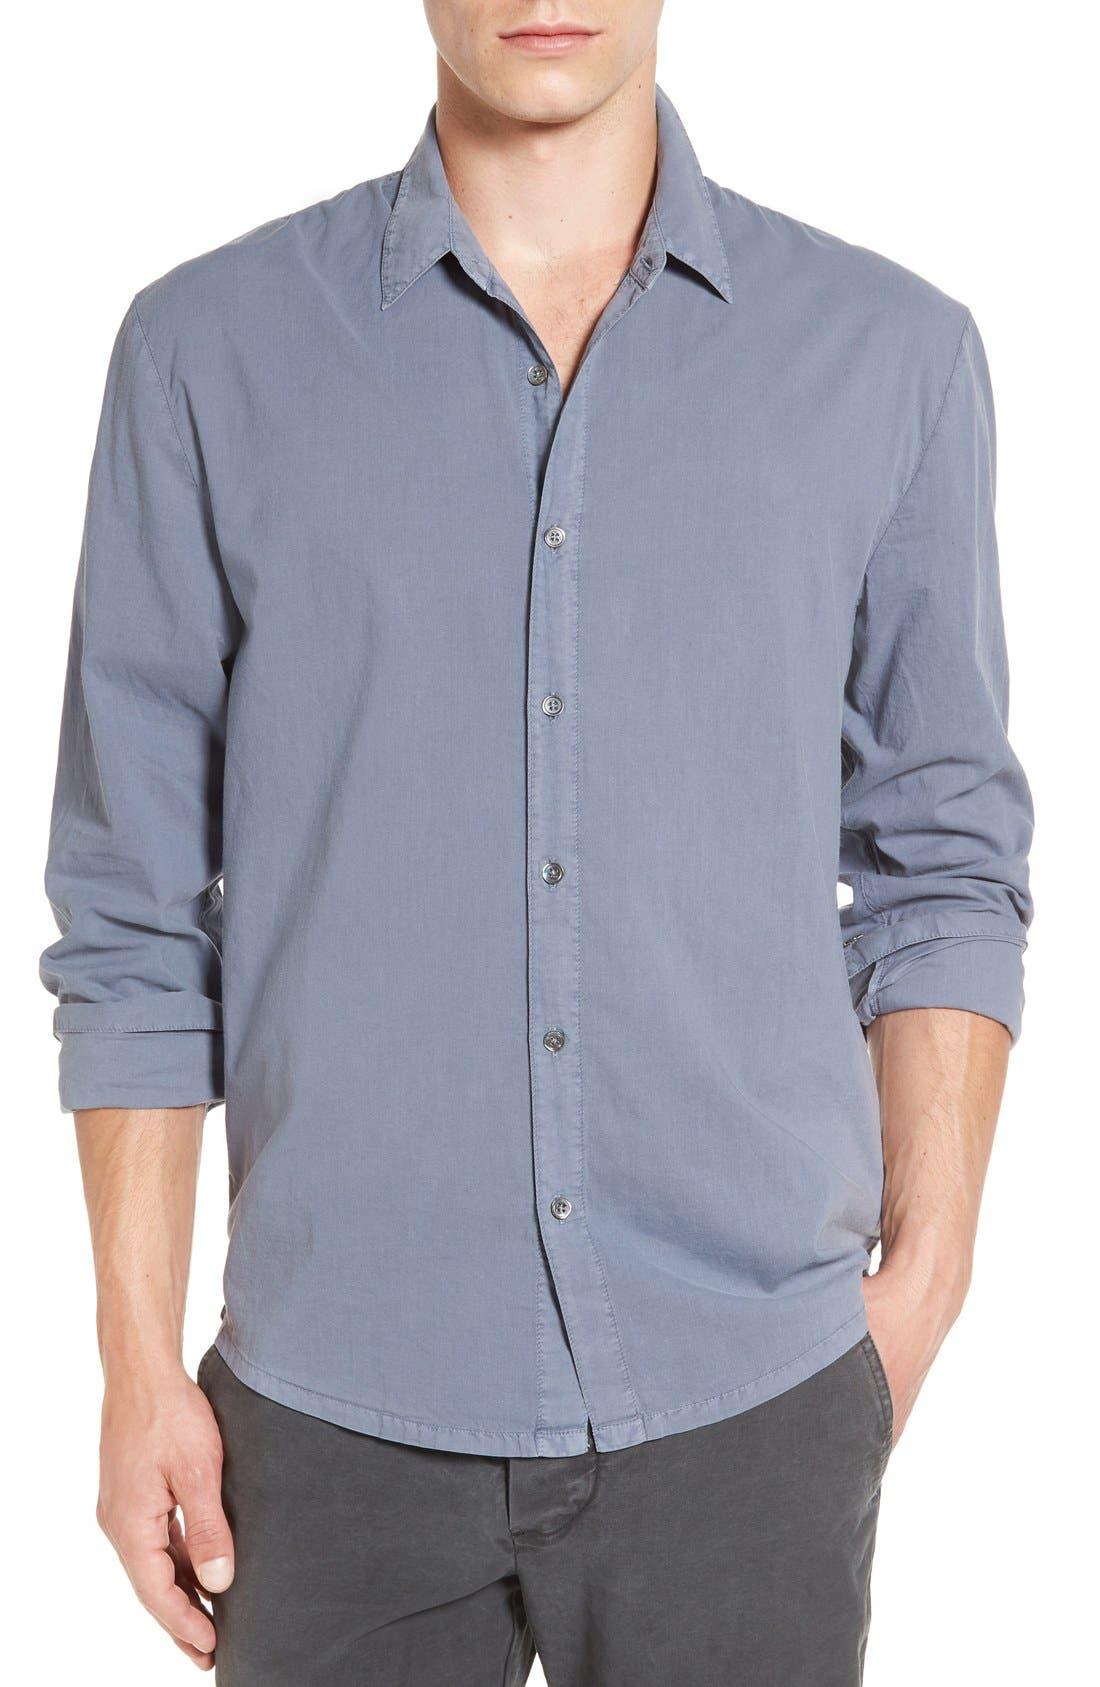 Main Image - James Perse 'Classics' Cotton Lawn Shirt